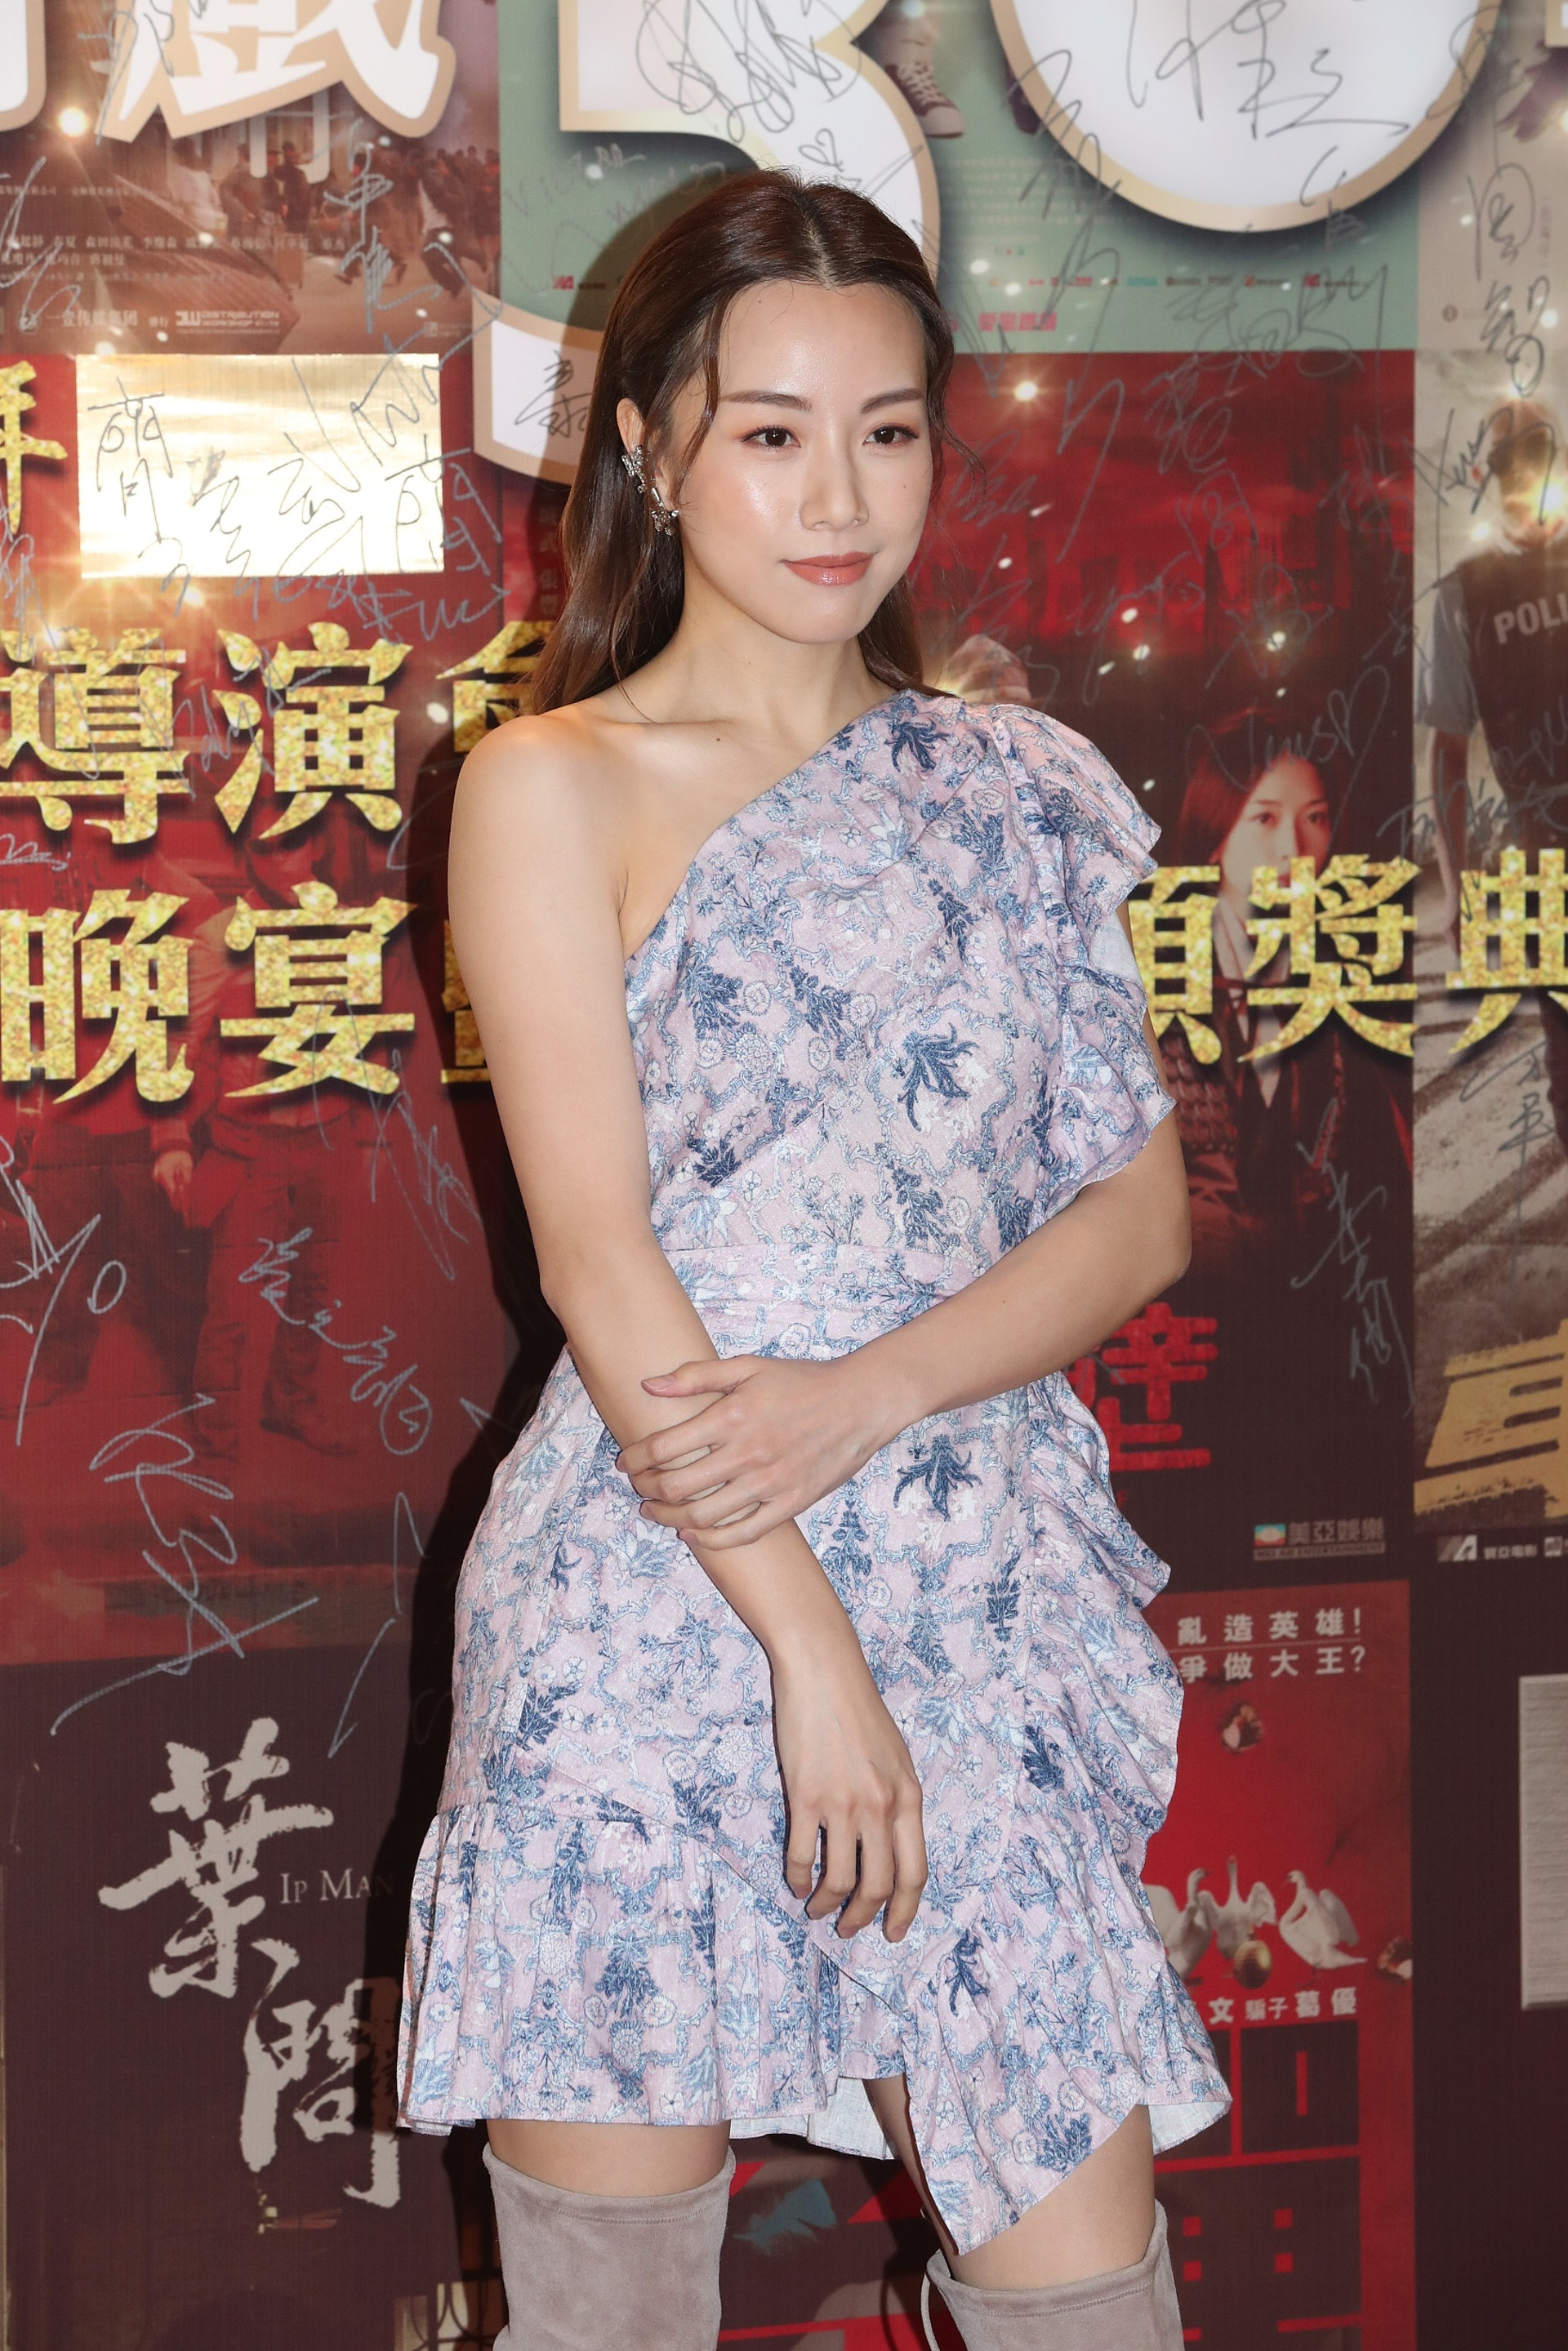 Stephy日前出席《香港電影導演會30周年晚宴暨年度頒獎禮》的早春衣著令人眼前一亮。(視覺中國)